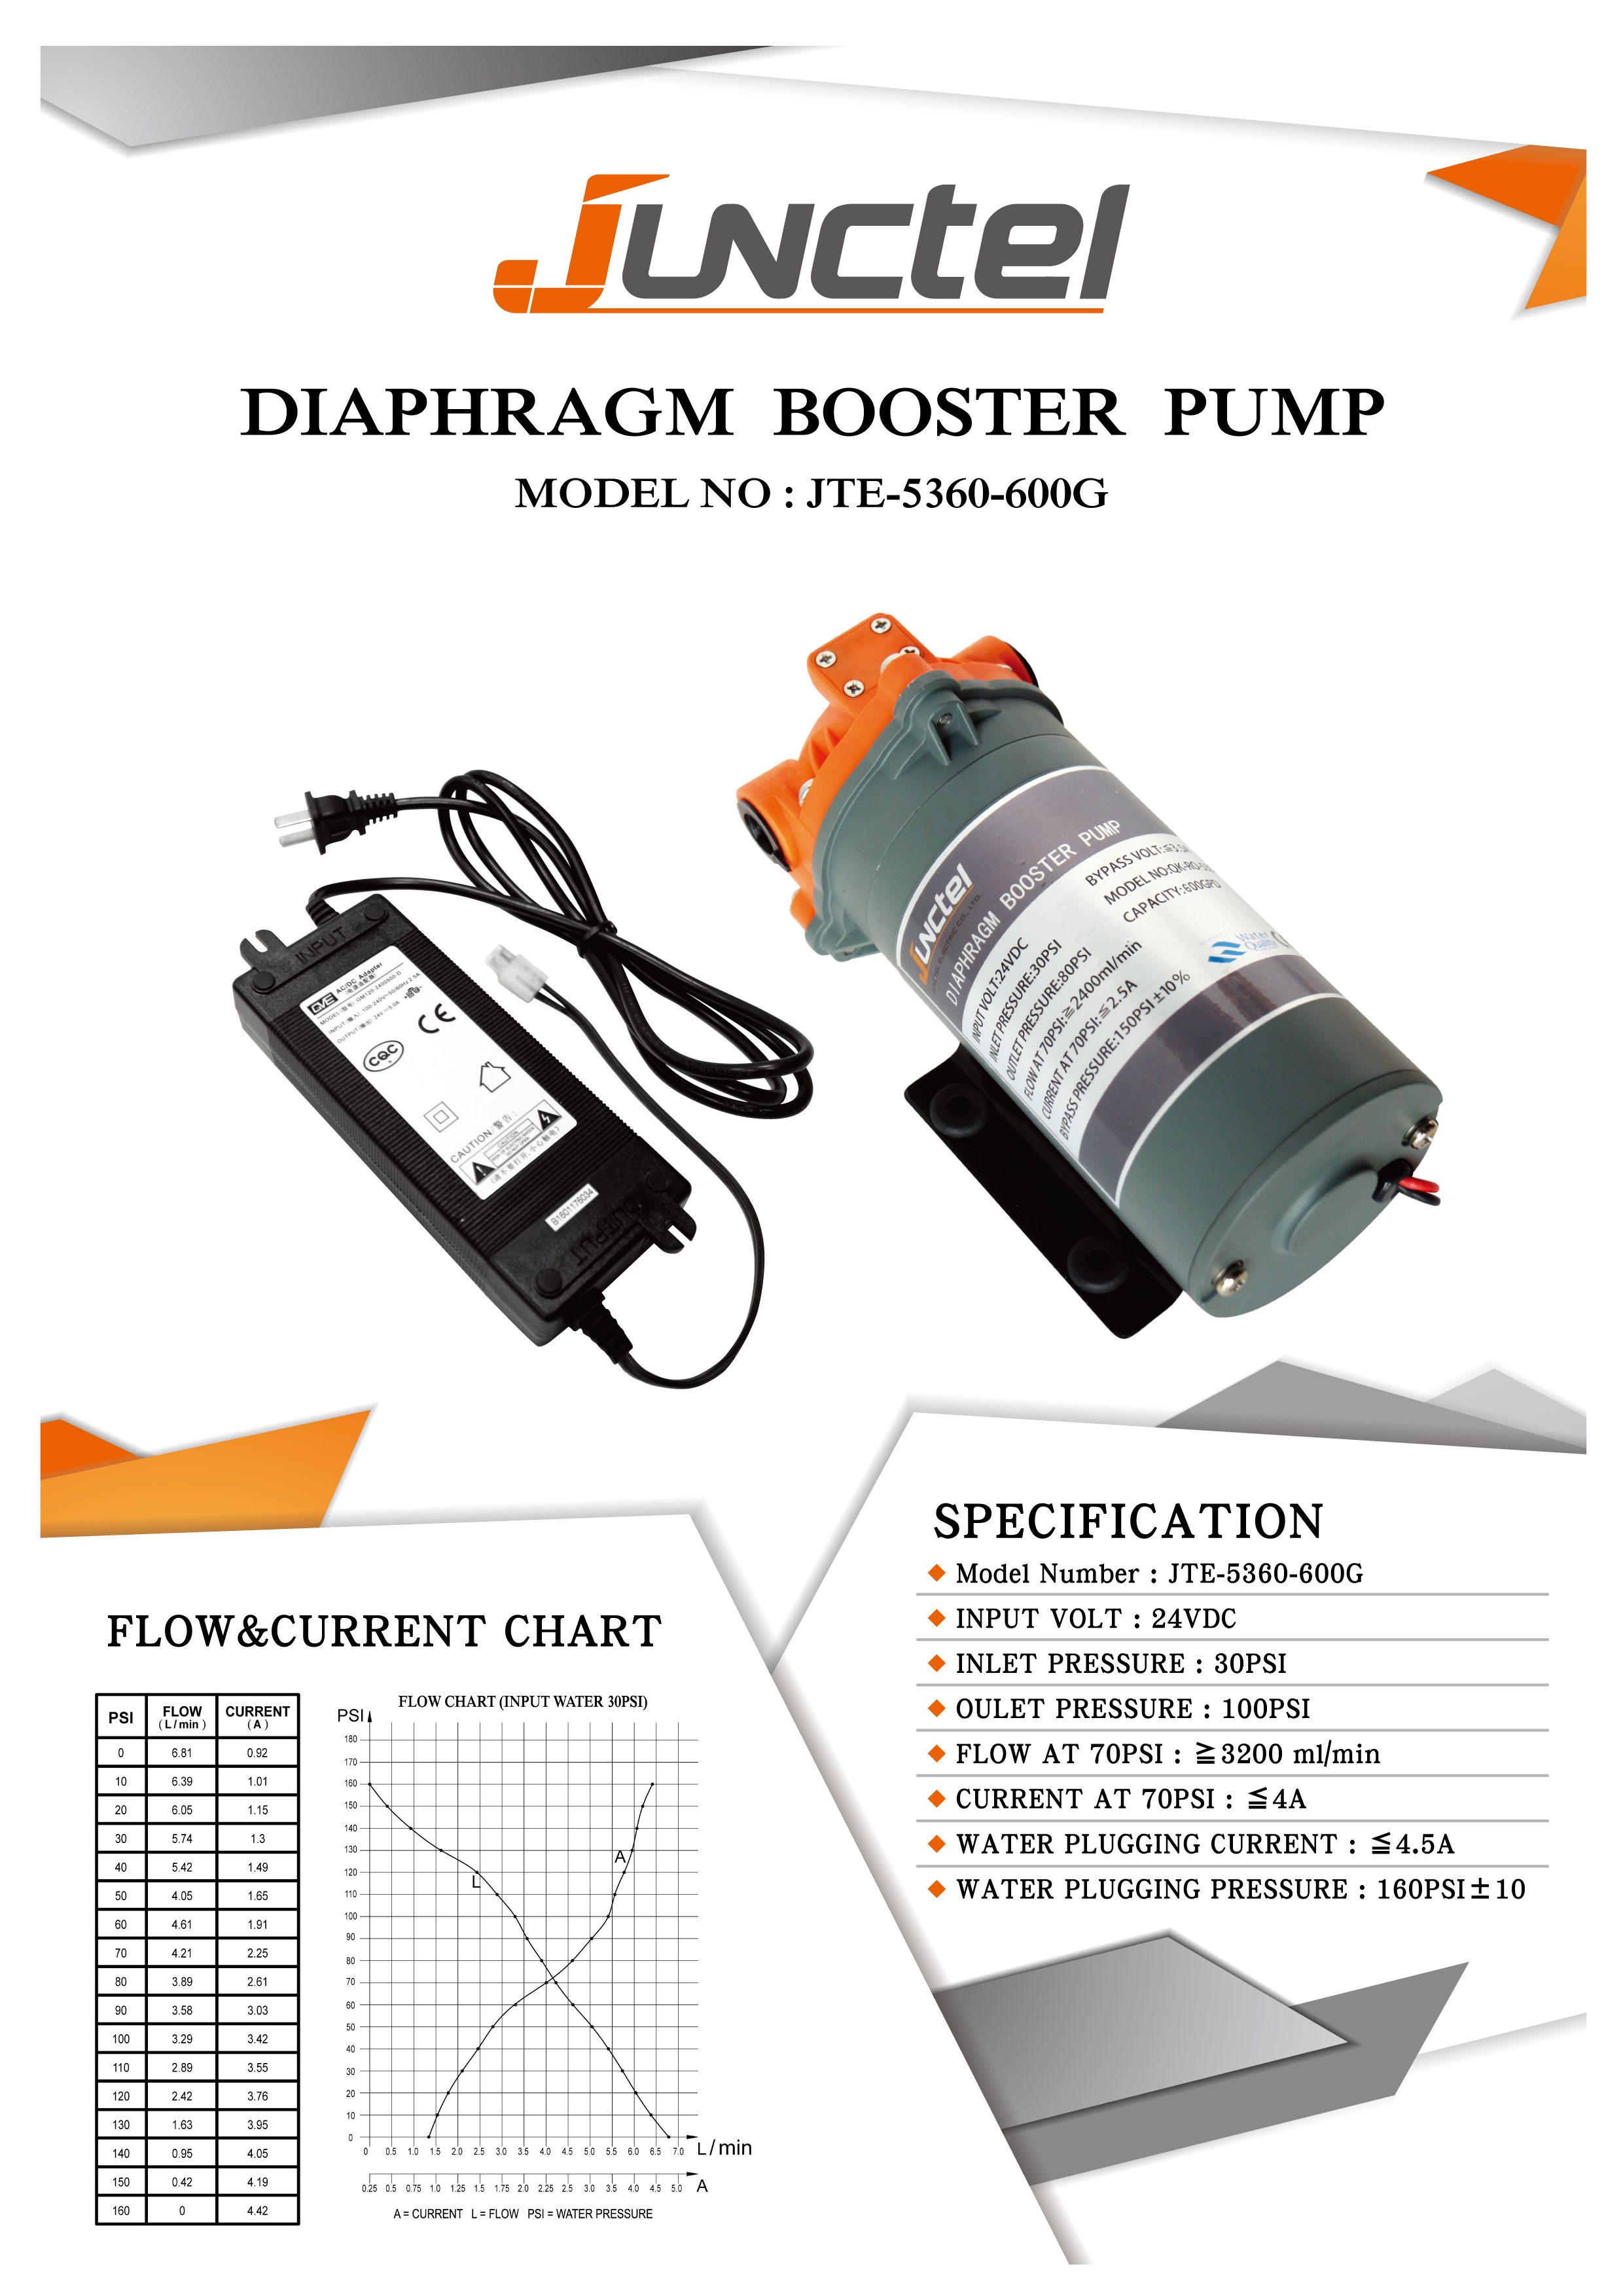 Taiwan Diaphragm Booster Pump 600gpd Aqua Care Co Ltd